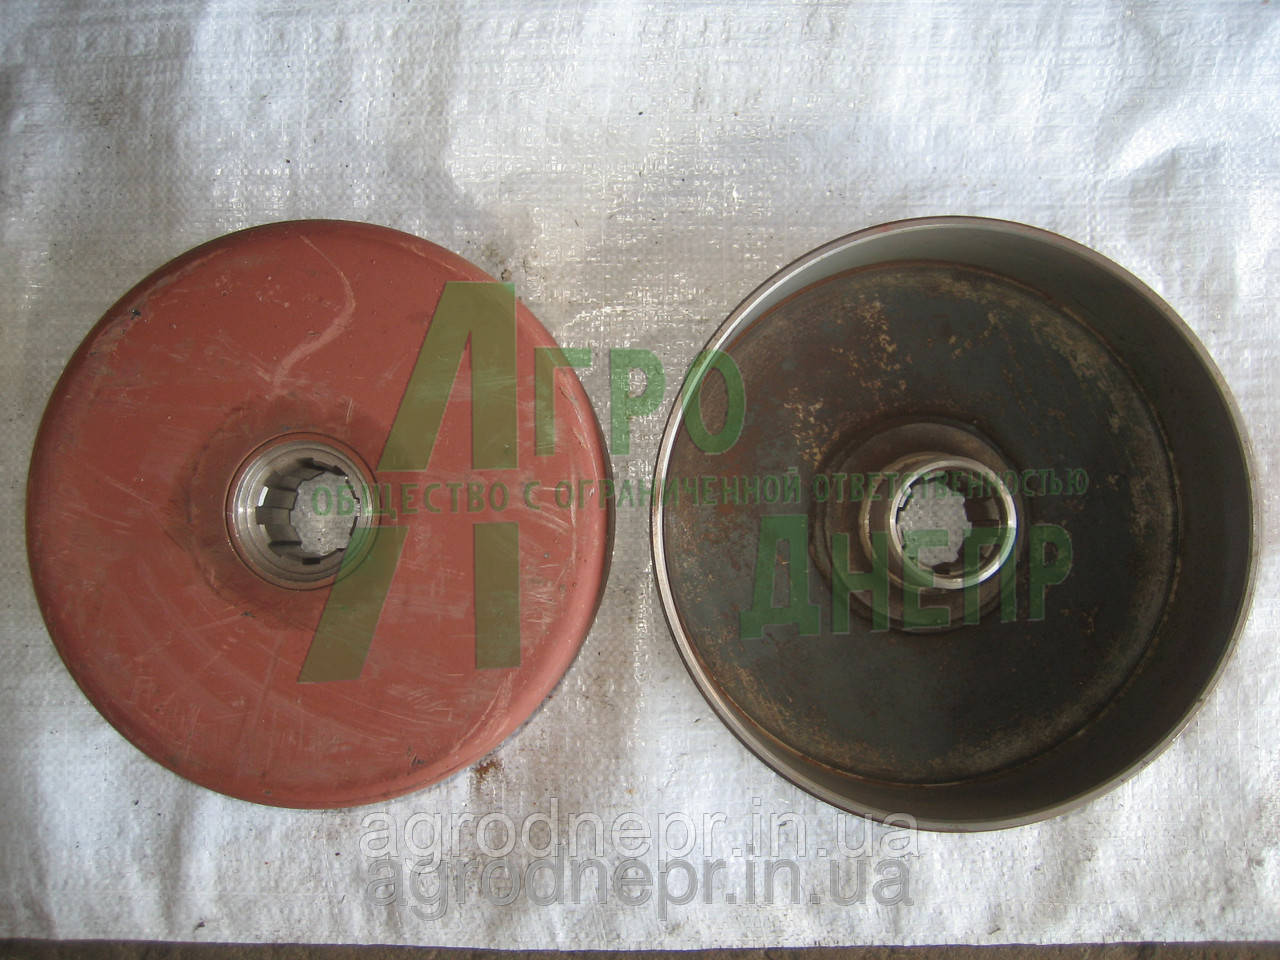 Тормозной барабан ЮМЗ 40-3502075-А1 СБ